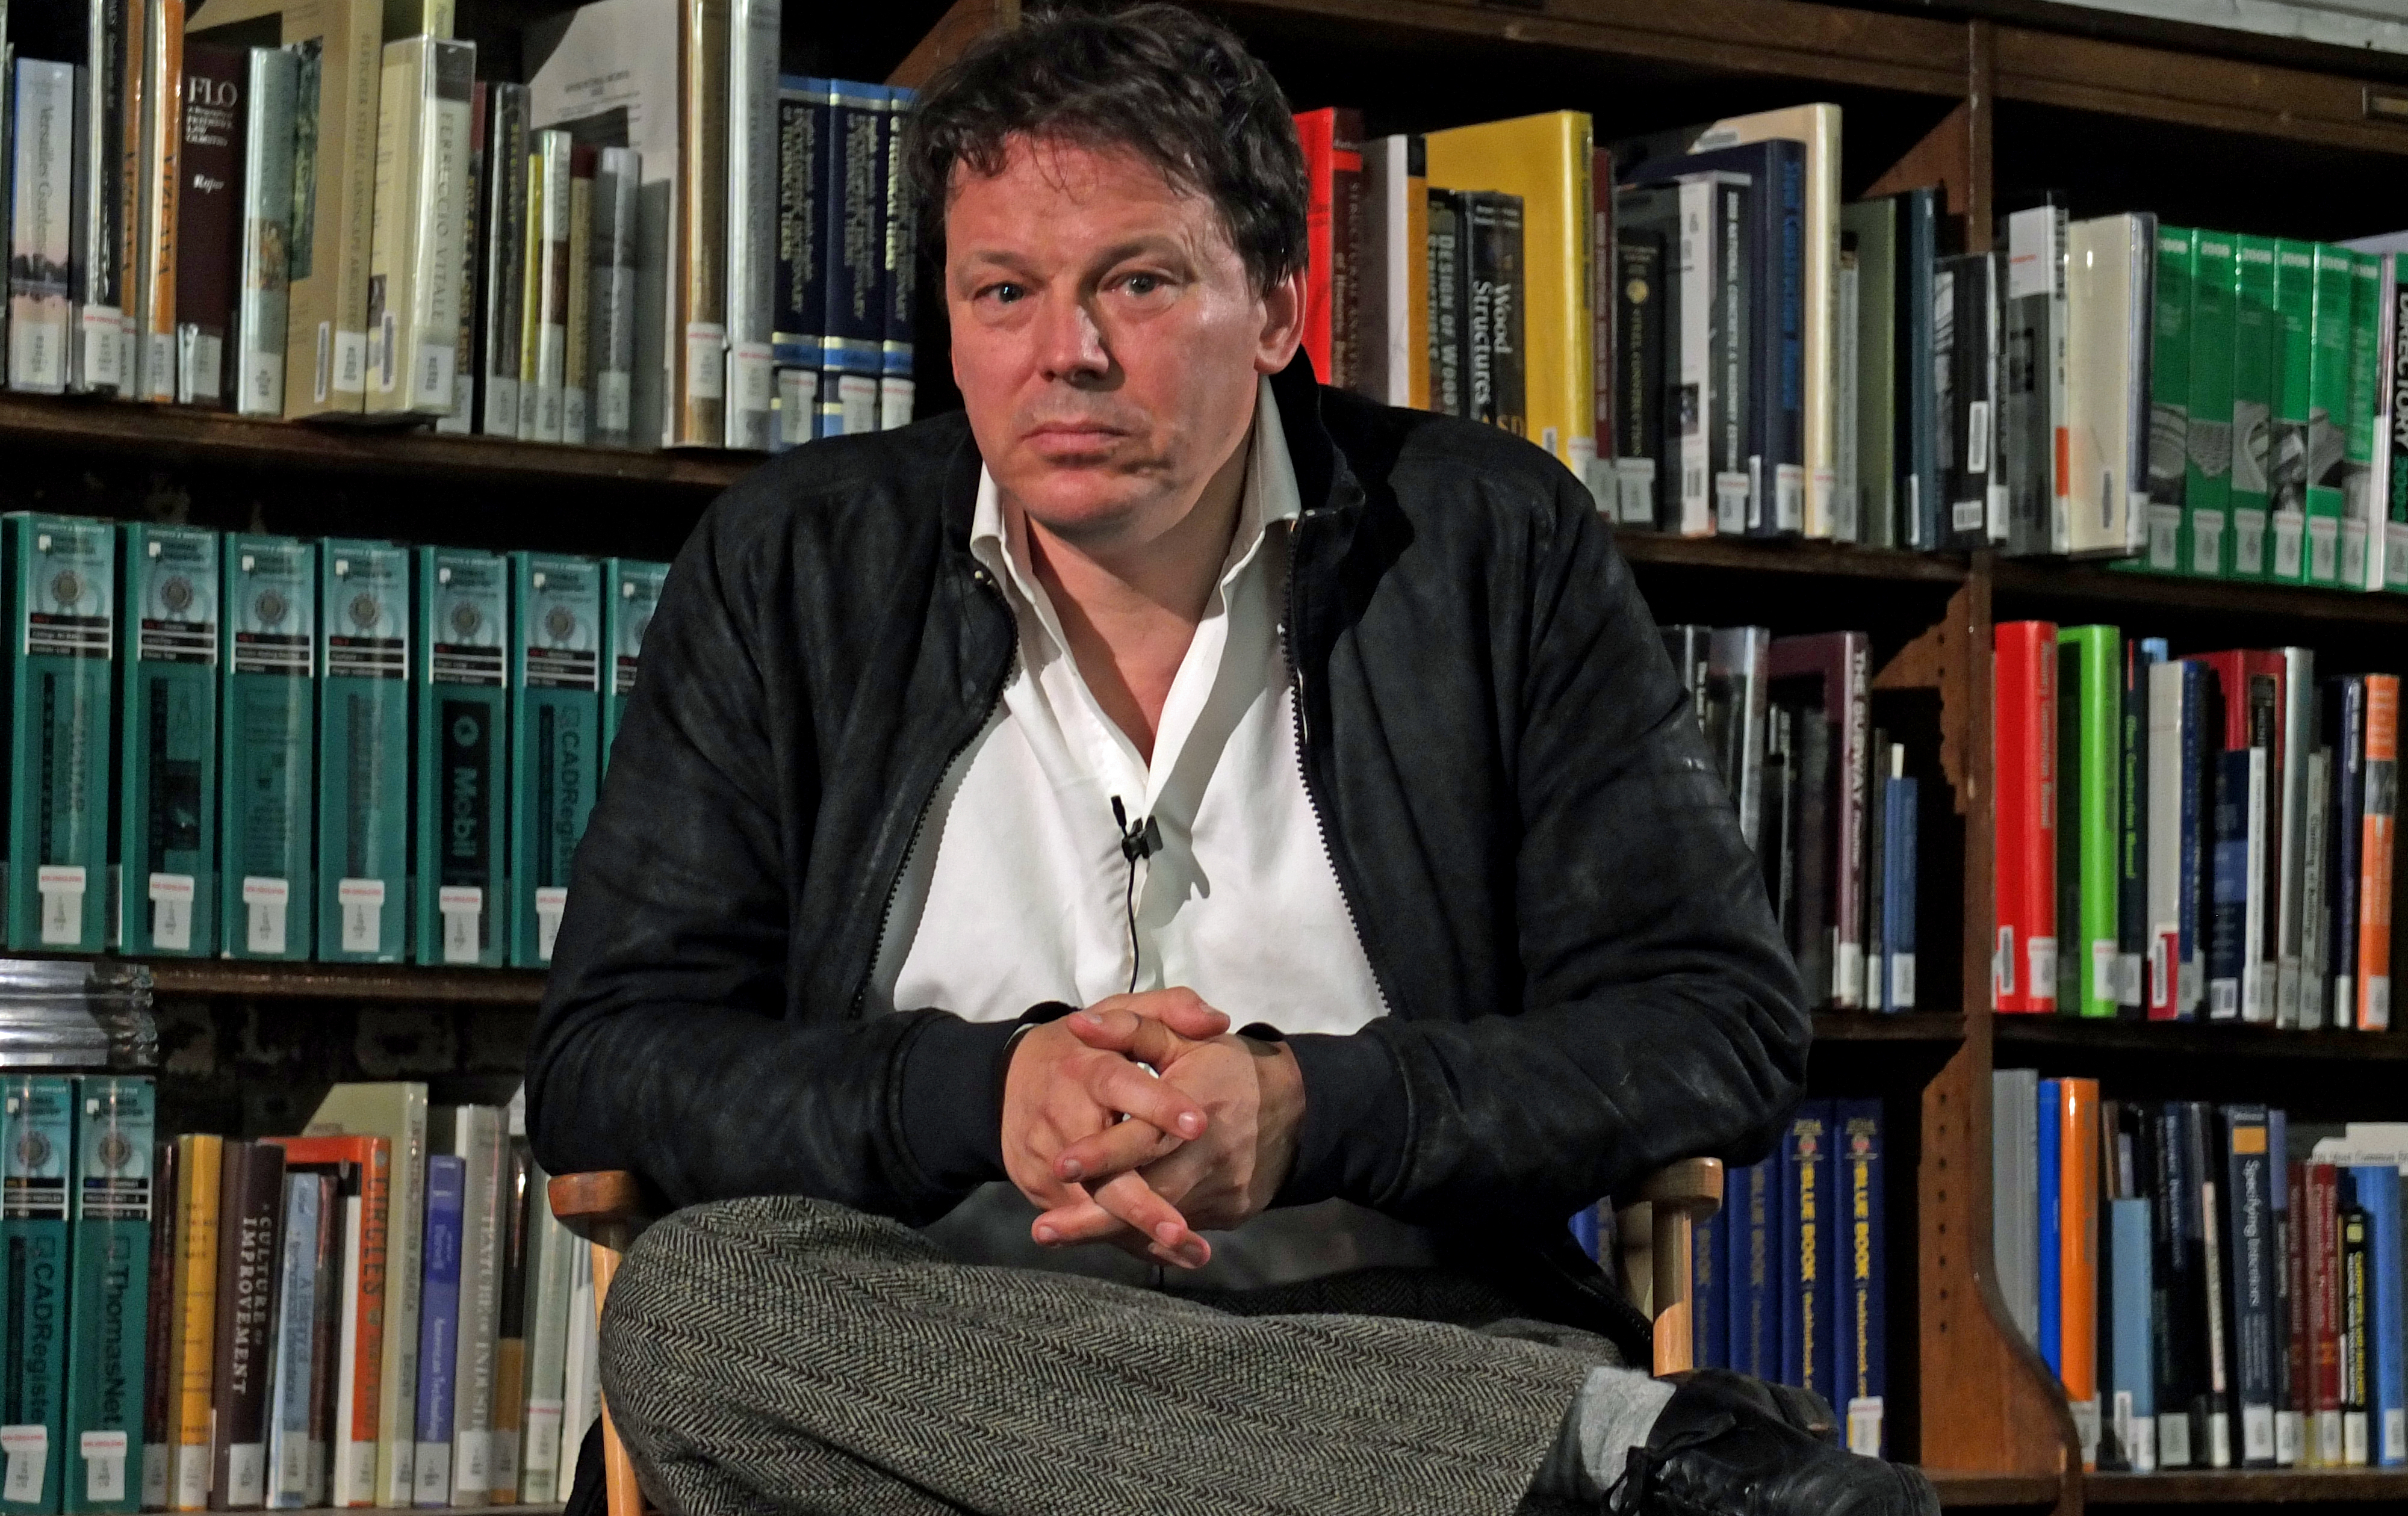 Author and Activist David Graeber Dead at 59